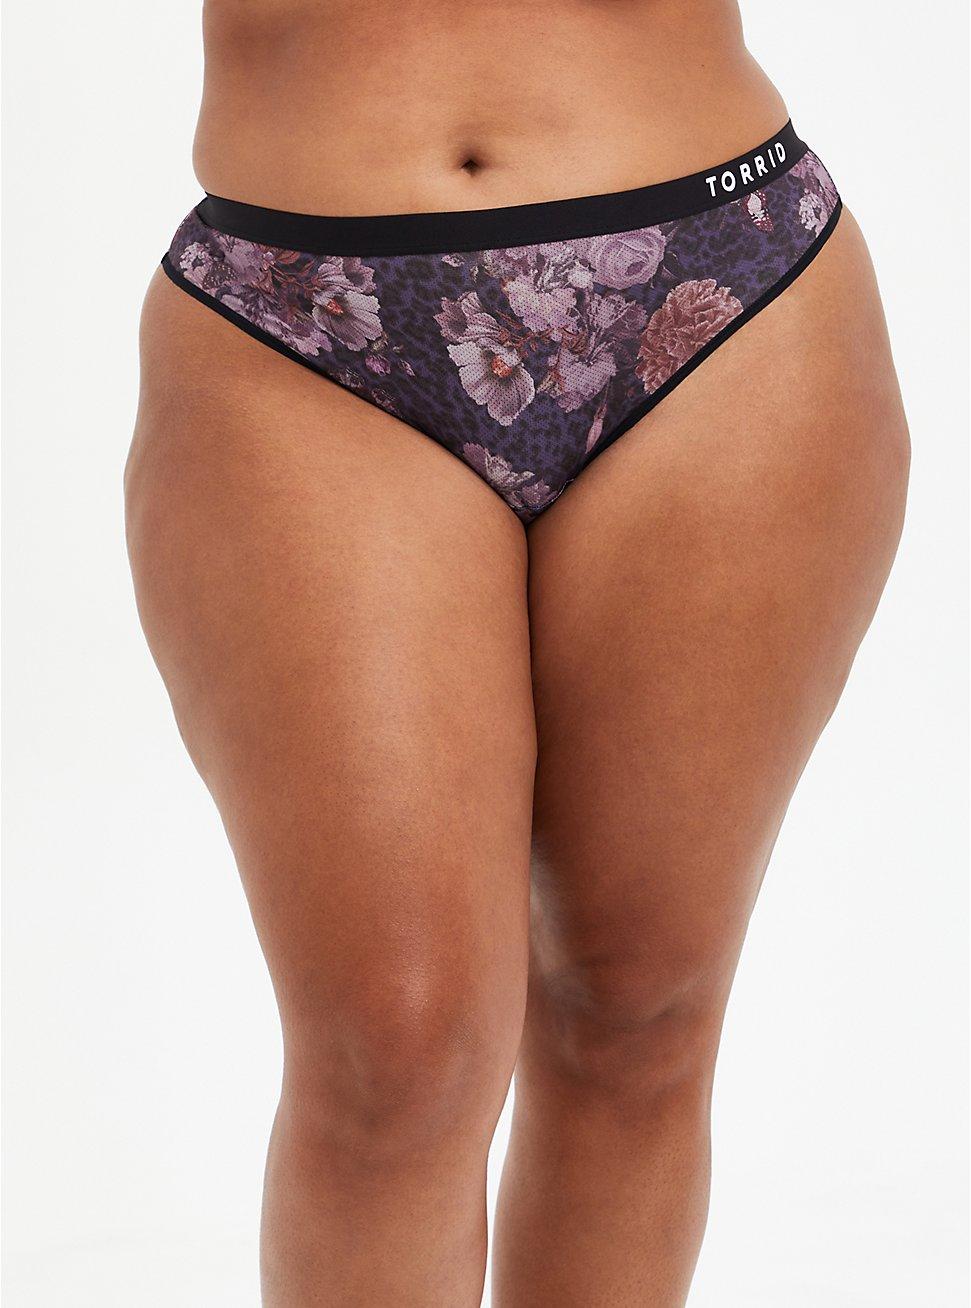 Plus Size Active Thong Panty - Microfiber Floral Black, , hi-res